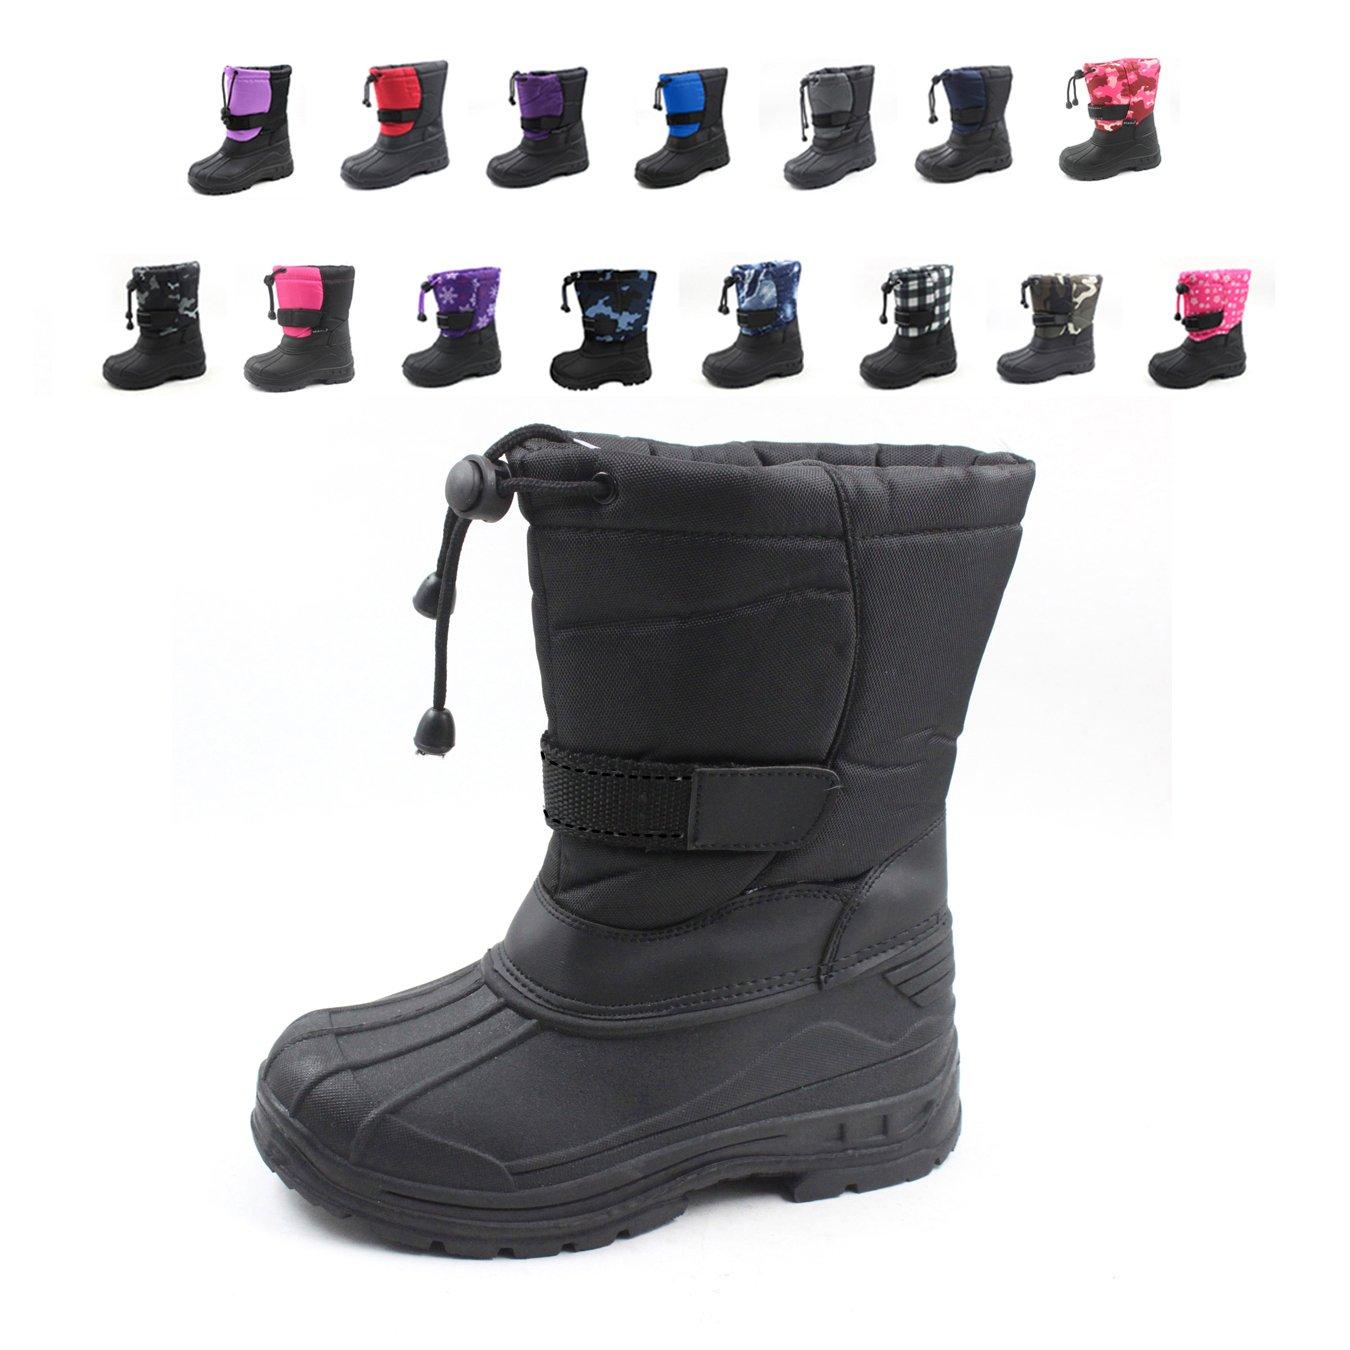 Snowkicks Cold Weather Kids Childrens Snow Boots Unisex